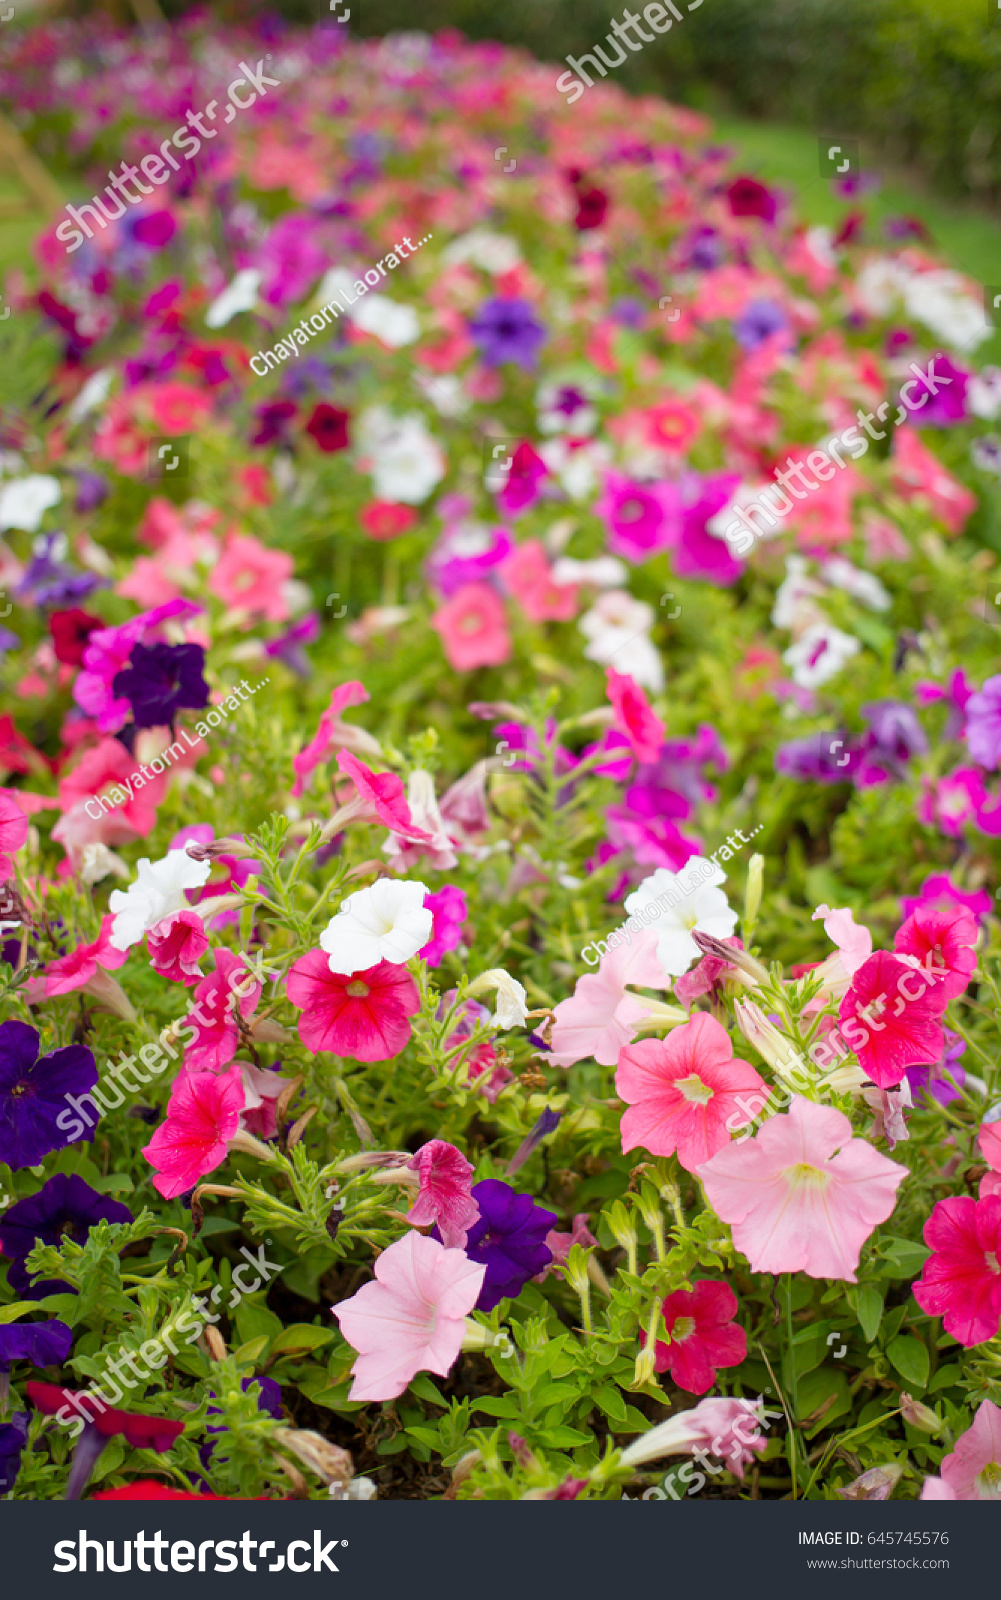 Beautiful multicolor of petunia flowers in garden close up ez canvas id 645745576 izmirmasajfo